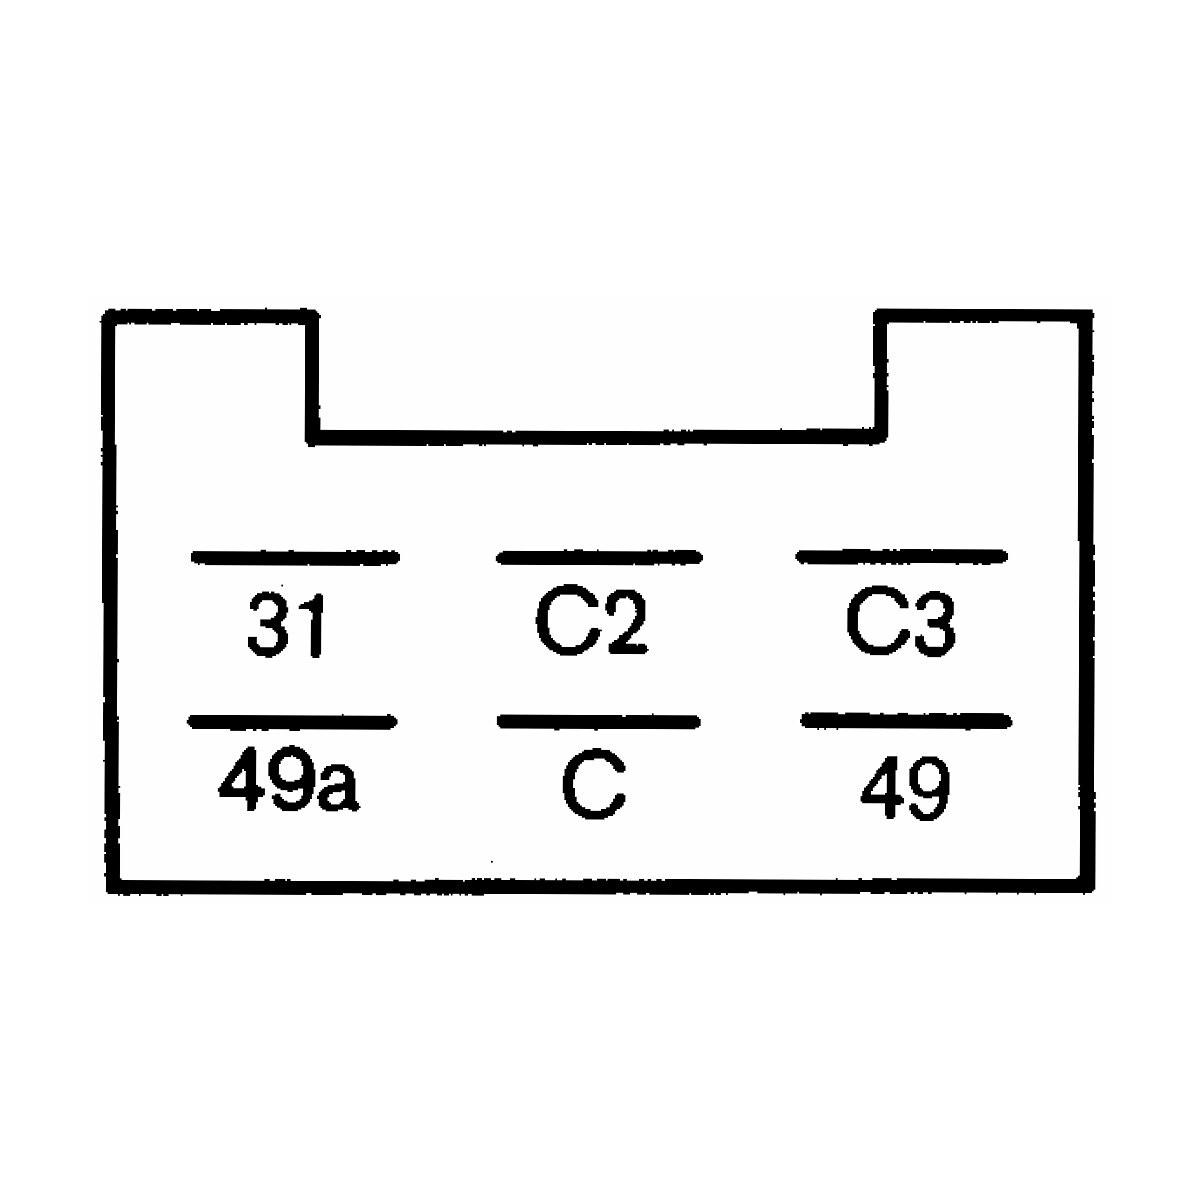 Flashing Relay Mf Ford Fiat Ih Jd Val St0260 Ikh 1130 Wiring Diagram